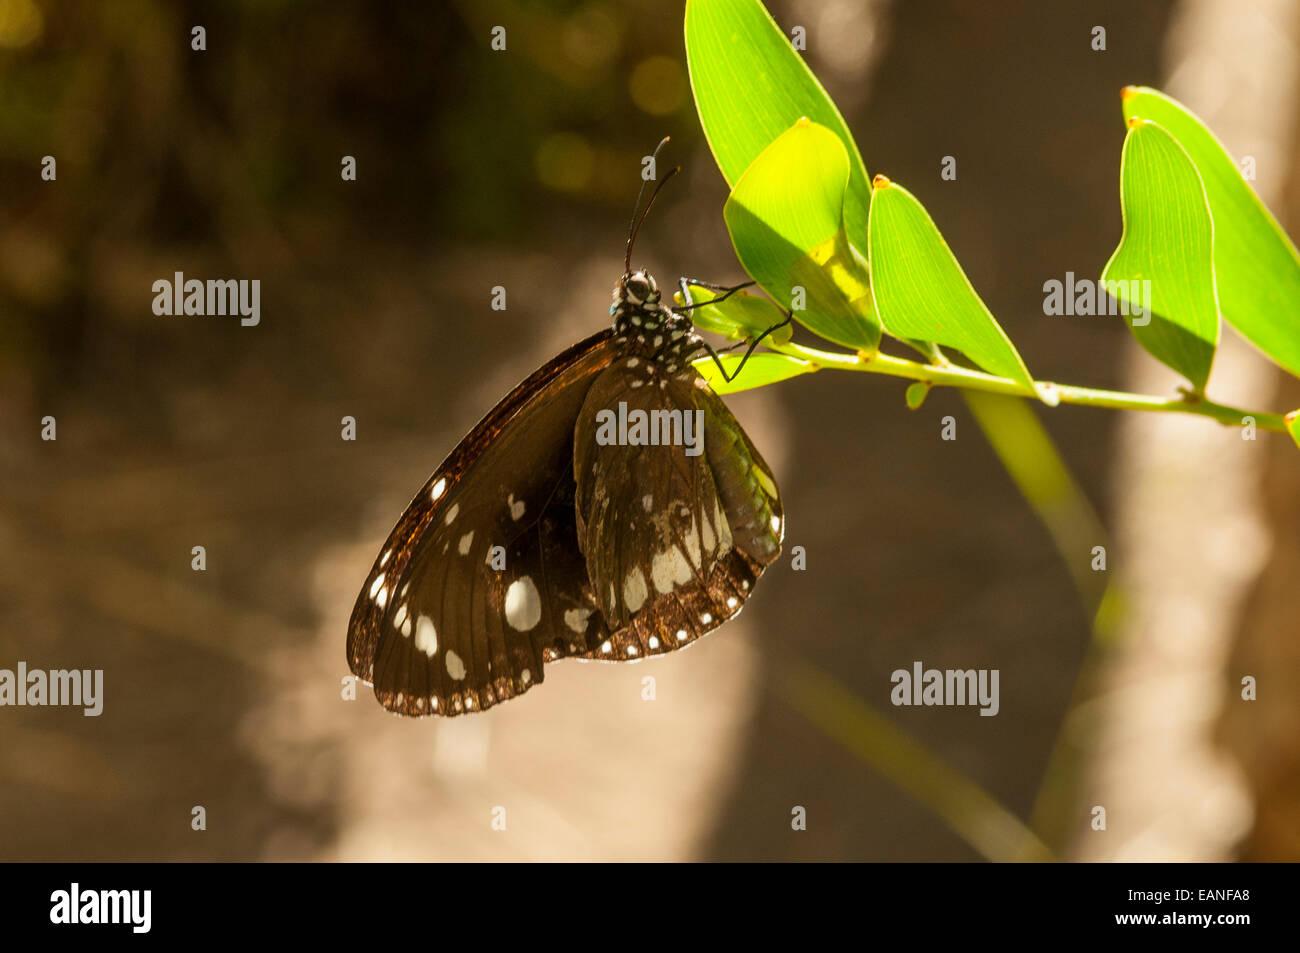 Common Crow Butterfly, Euploea core in Emma Gorge, El Questro, the Kimberley, WA, Australia - Stock Image